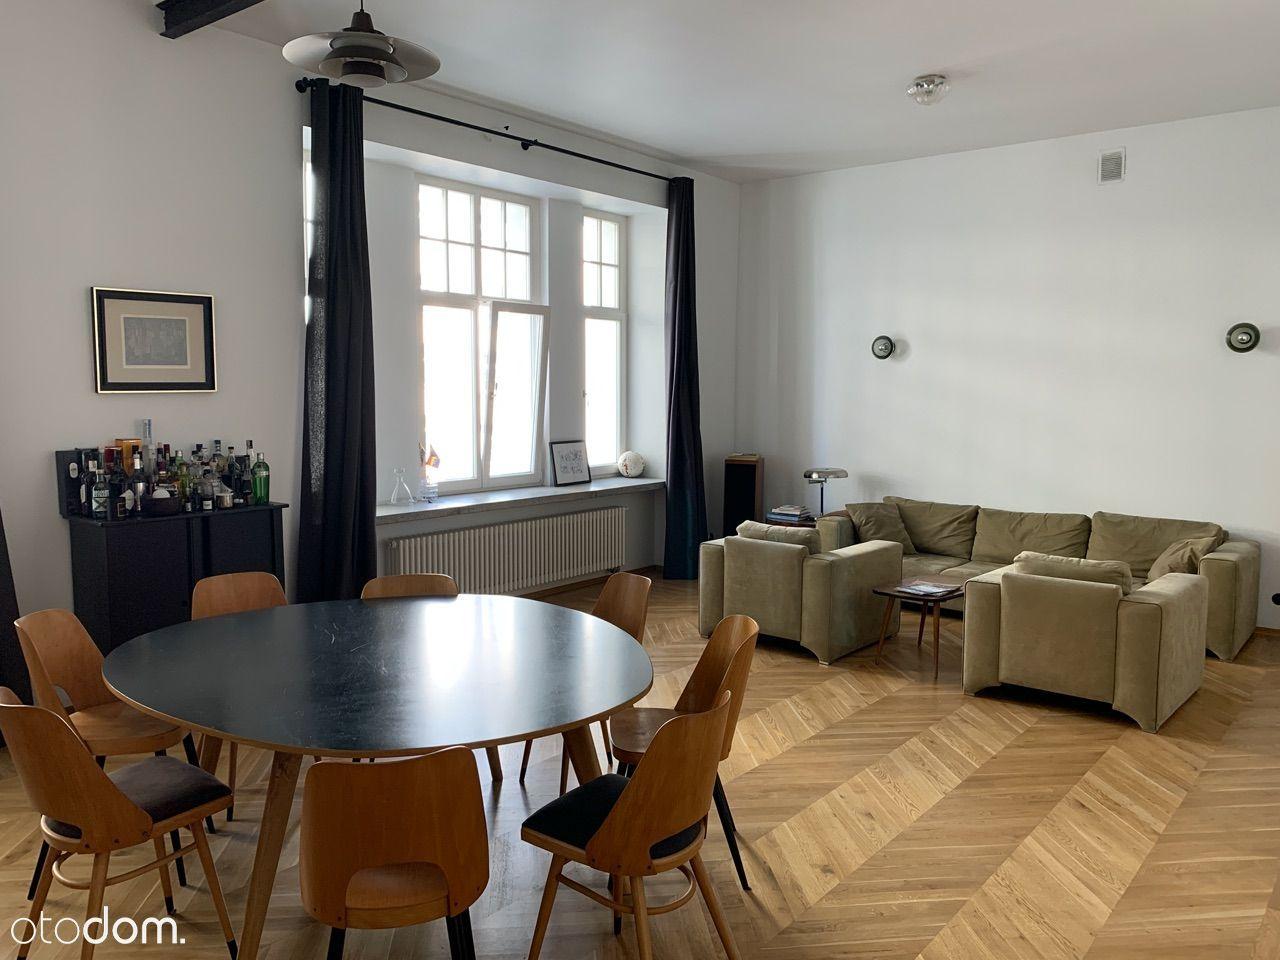 Apartament na Okólnik